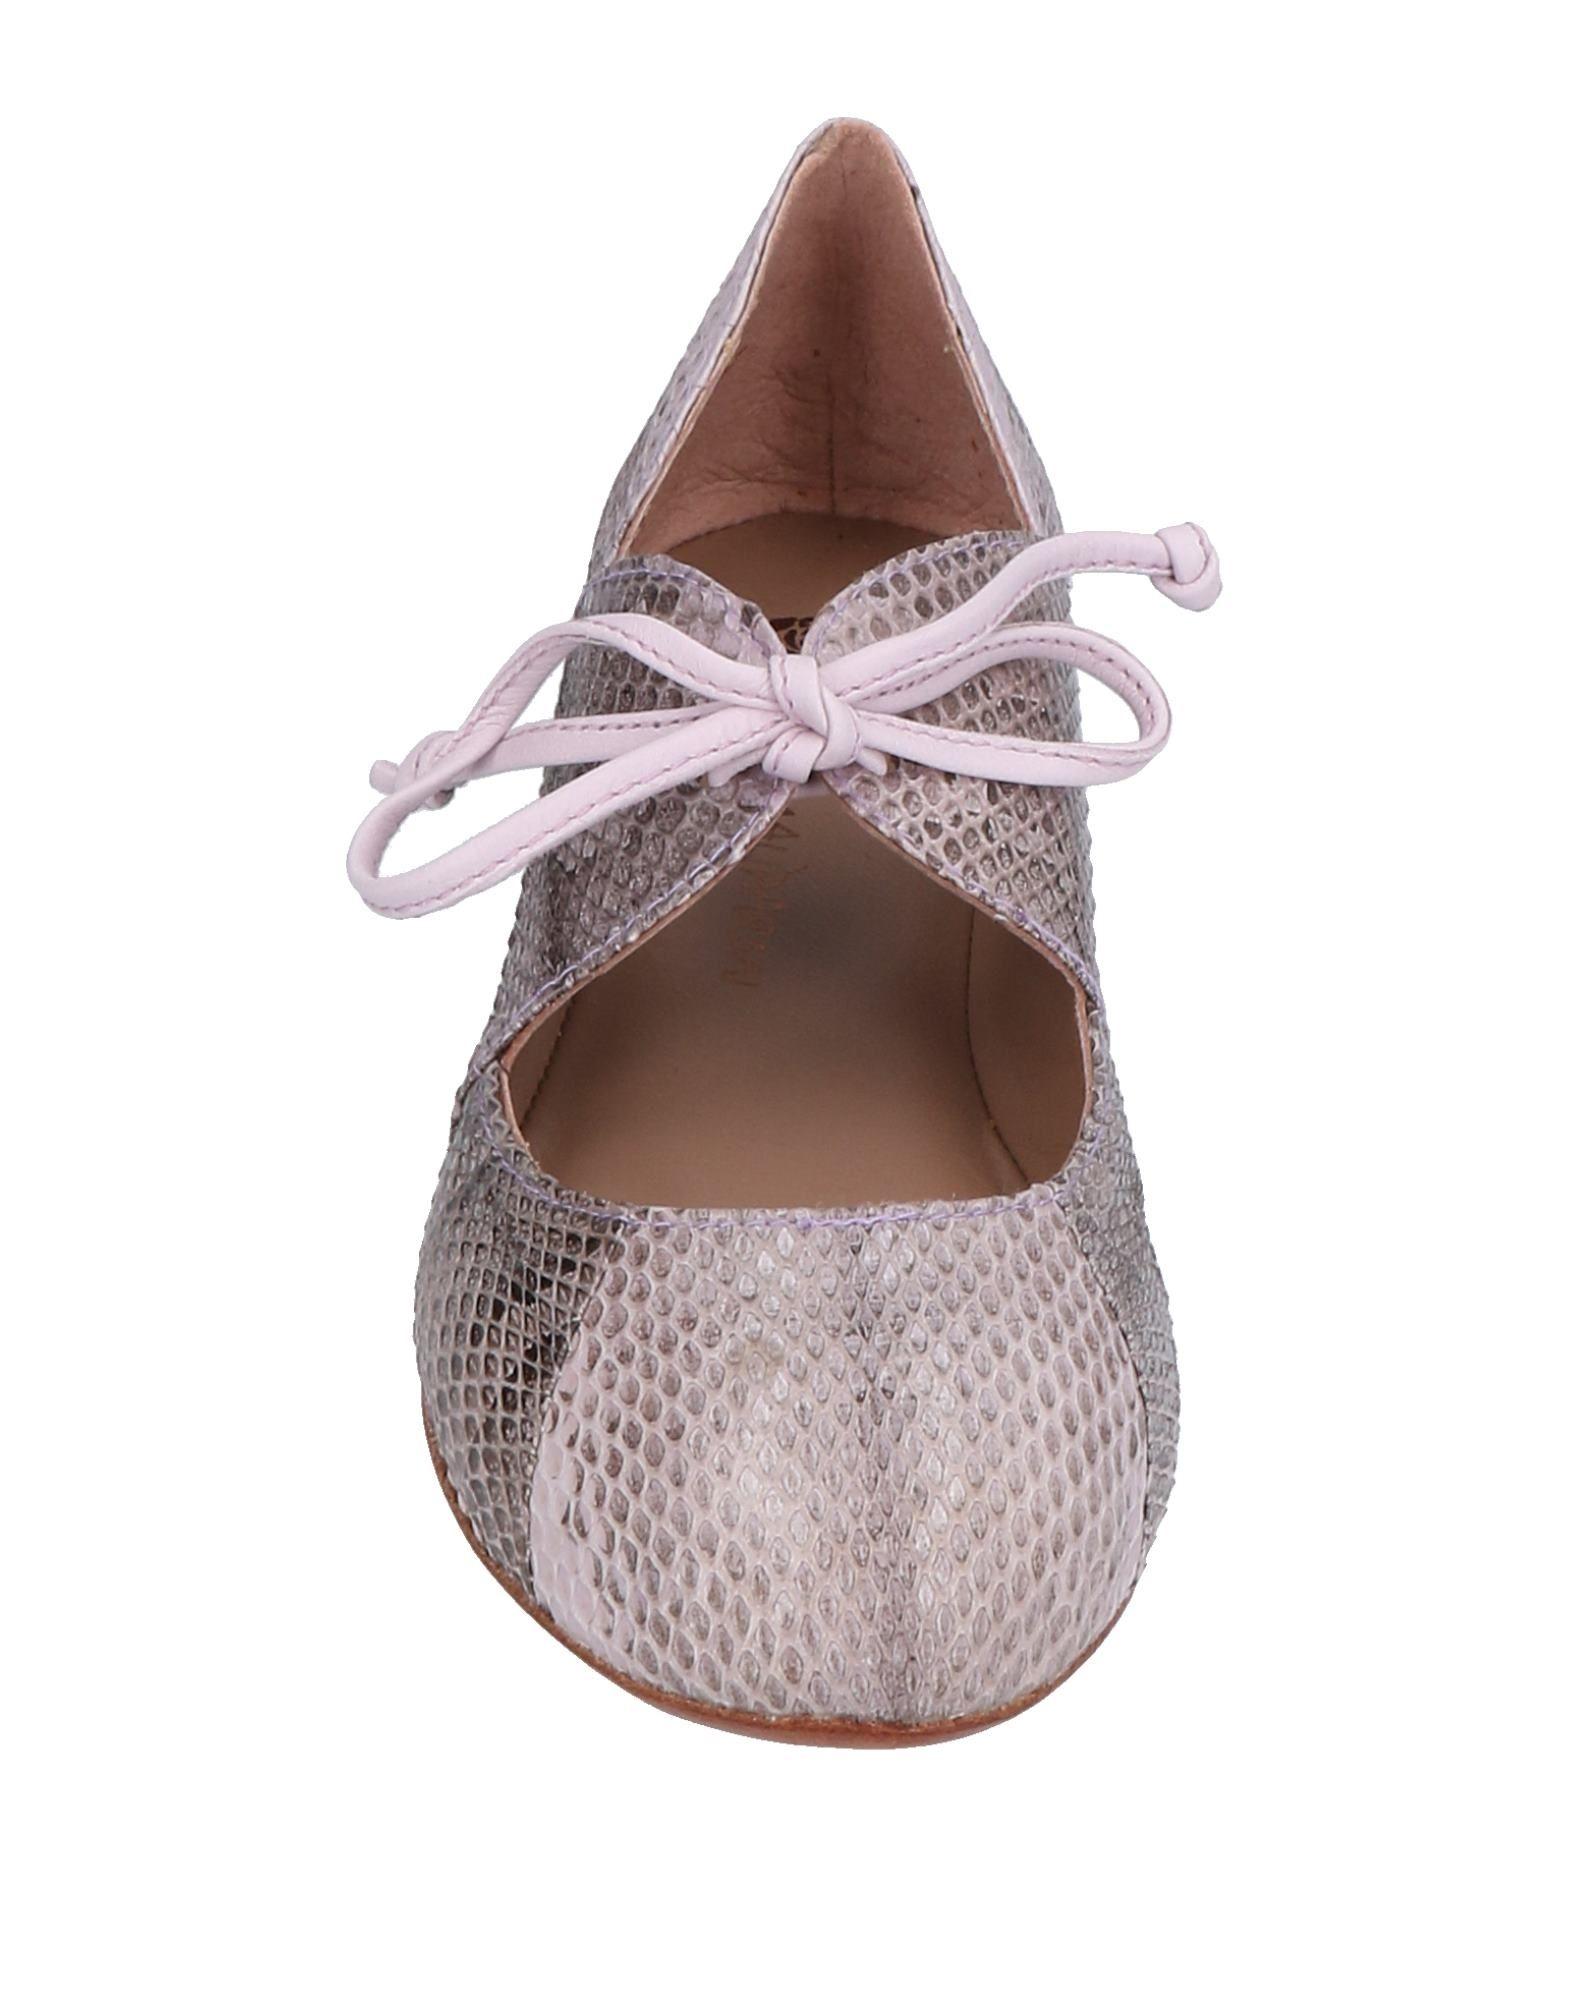 Stilvolle billige Schuhe Malìparmi Ballerinas Damen  11131709KV 11131709KV 11131709KV 6375cf